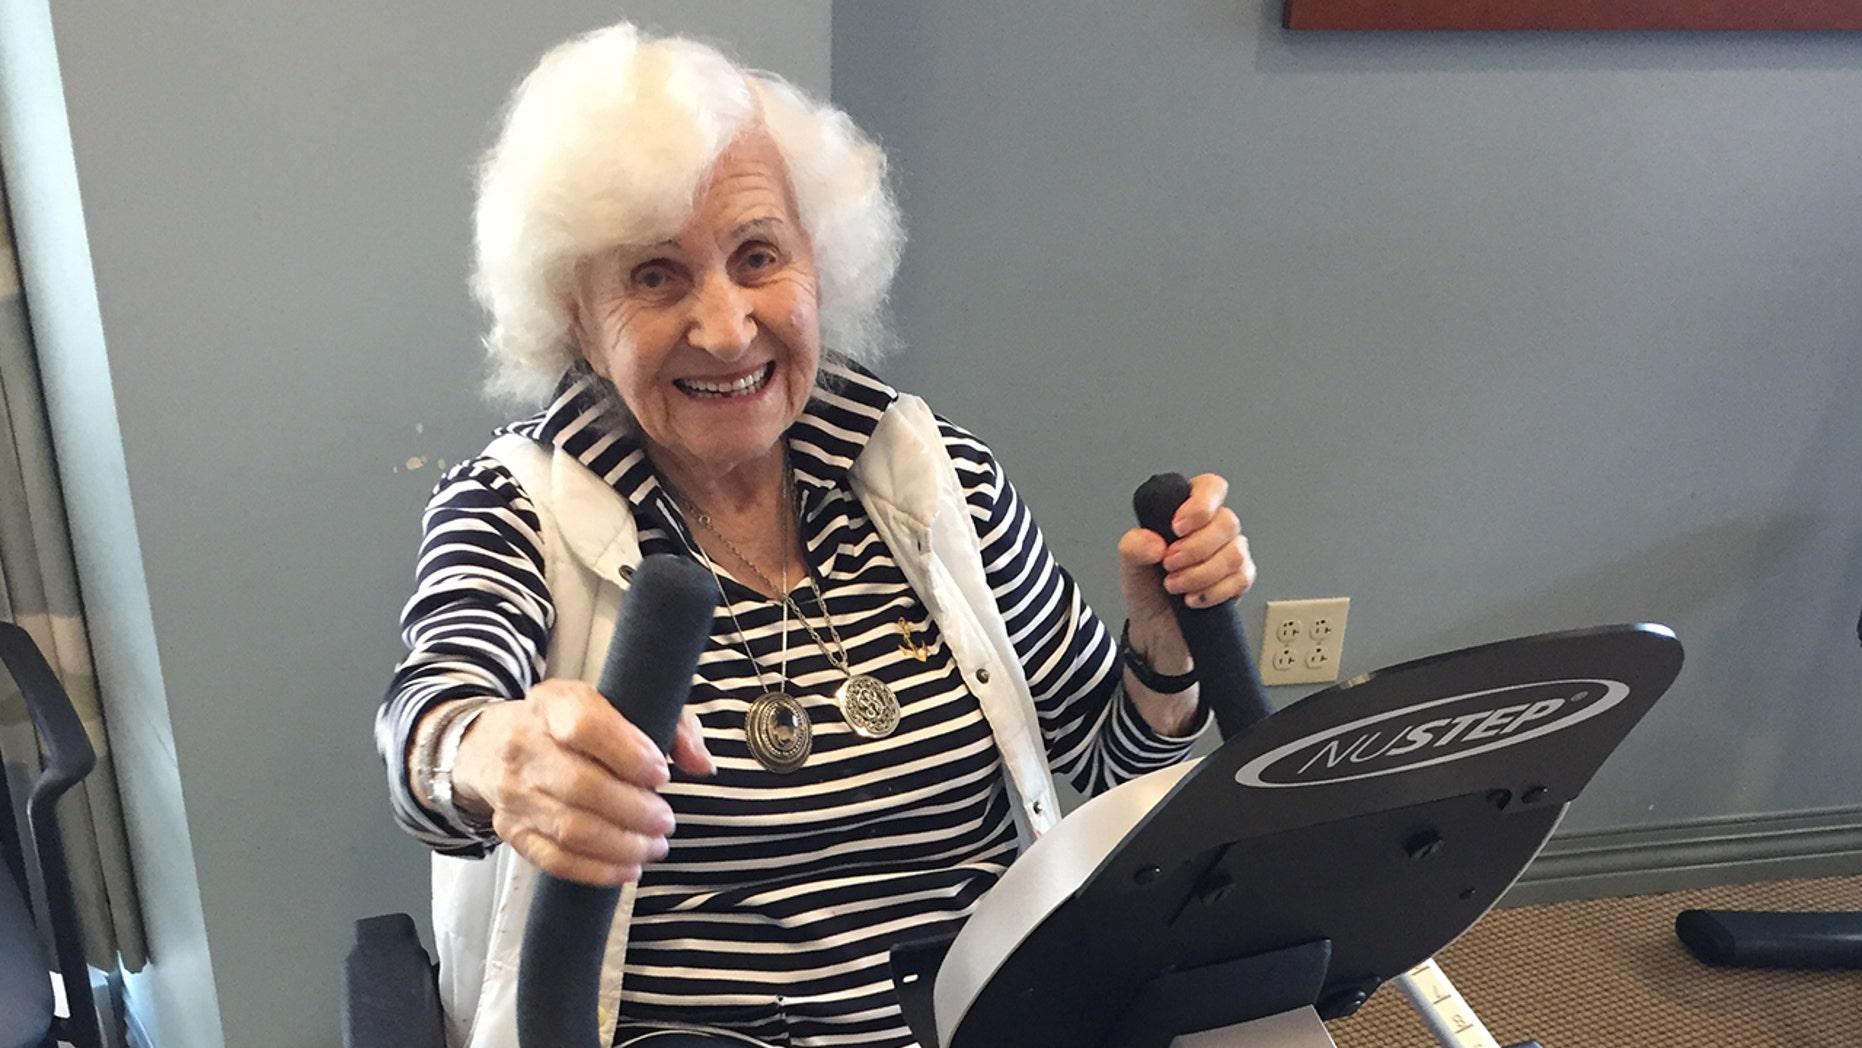 Regina Zlotnik was all smiles for her birthday workout.